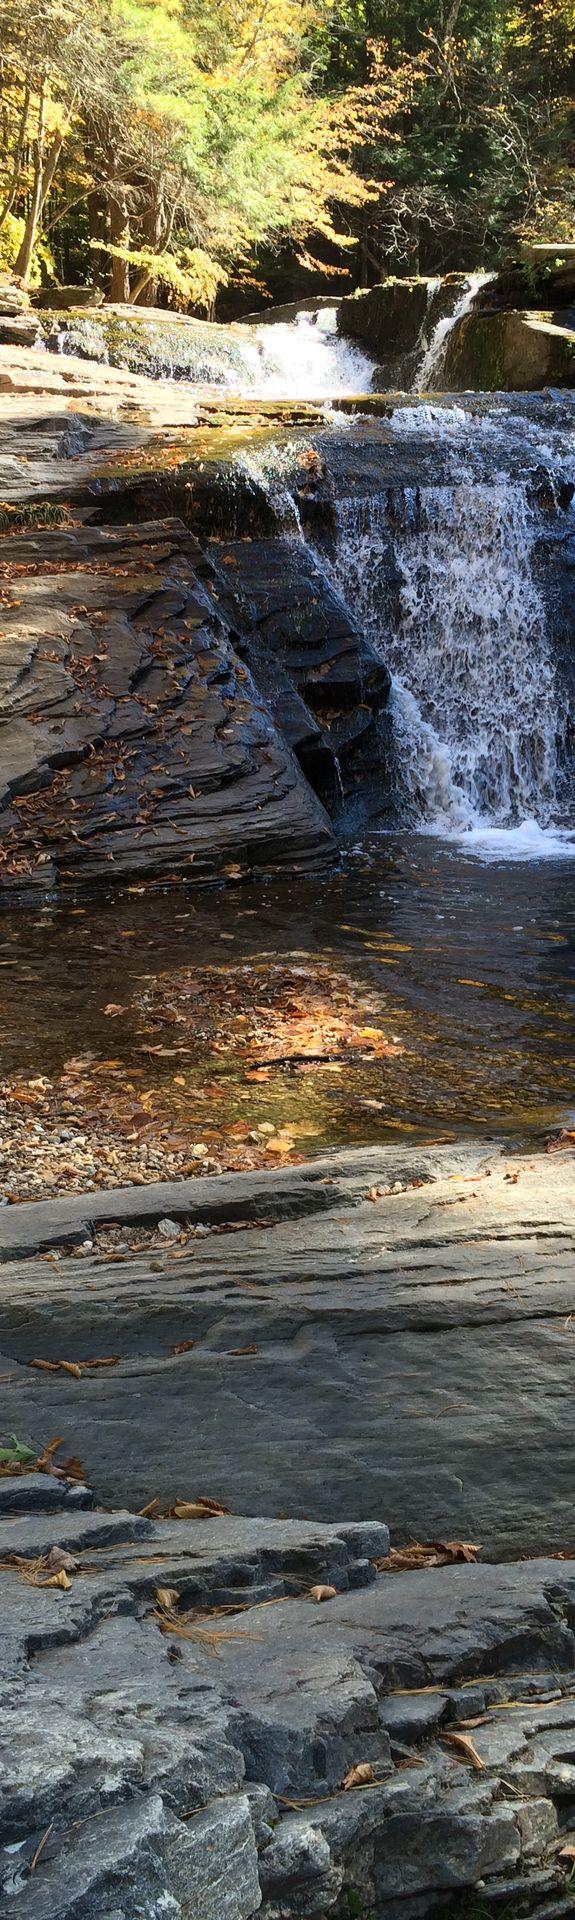 Lime Rock Park, Lakeville, CT, USA